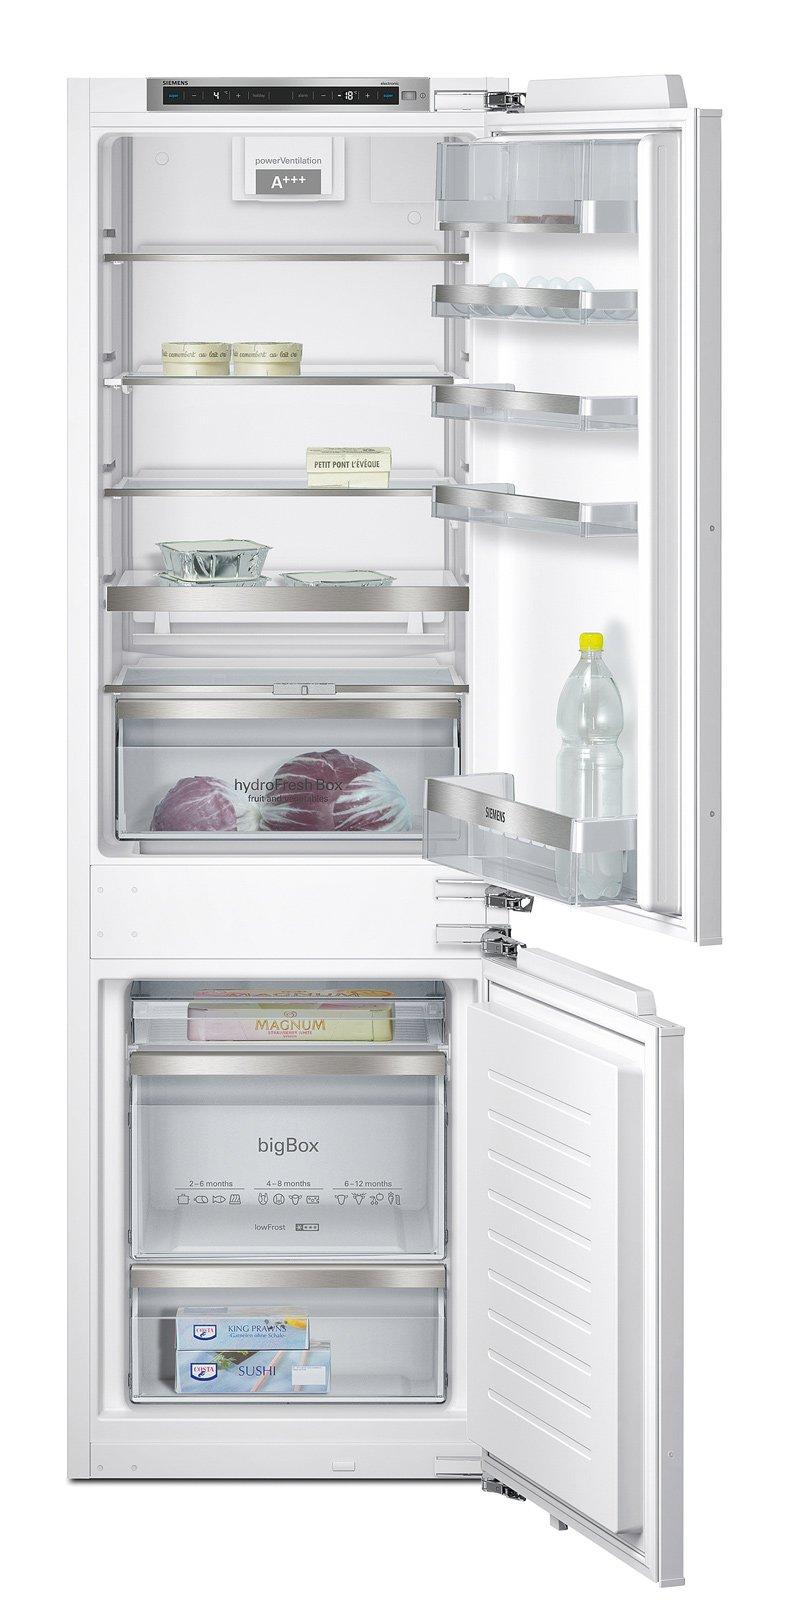 frigo temperatura ideale interesting samsung frigorifero combinato smart line rbferncsa classe. Black Bedroom Furniture Sets. Home Design Ideas